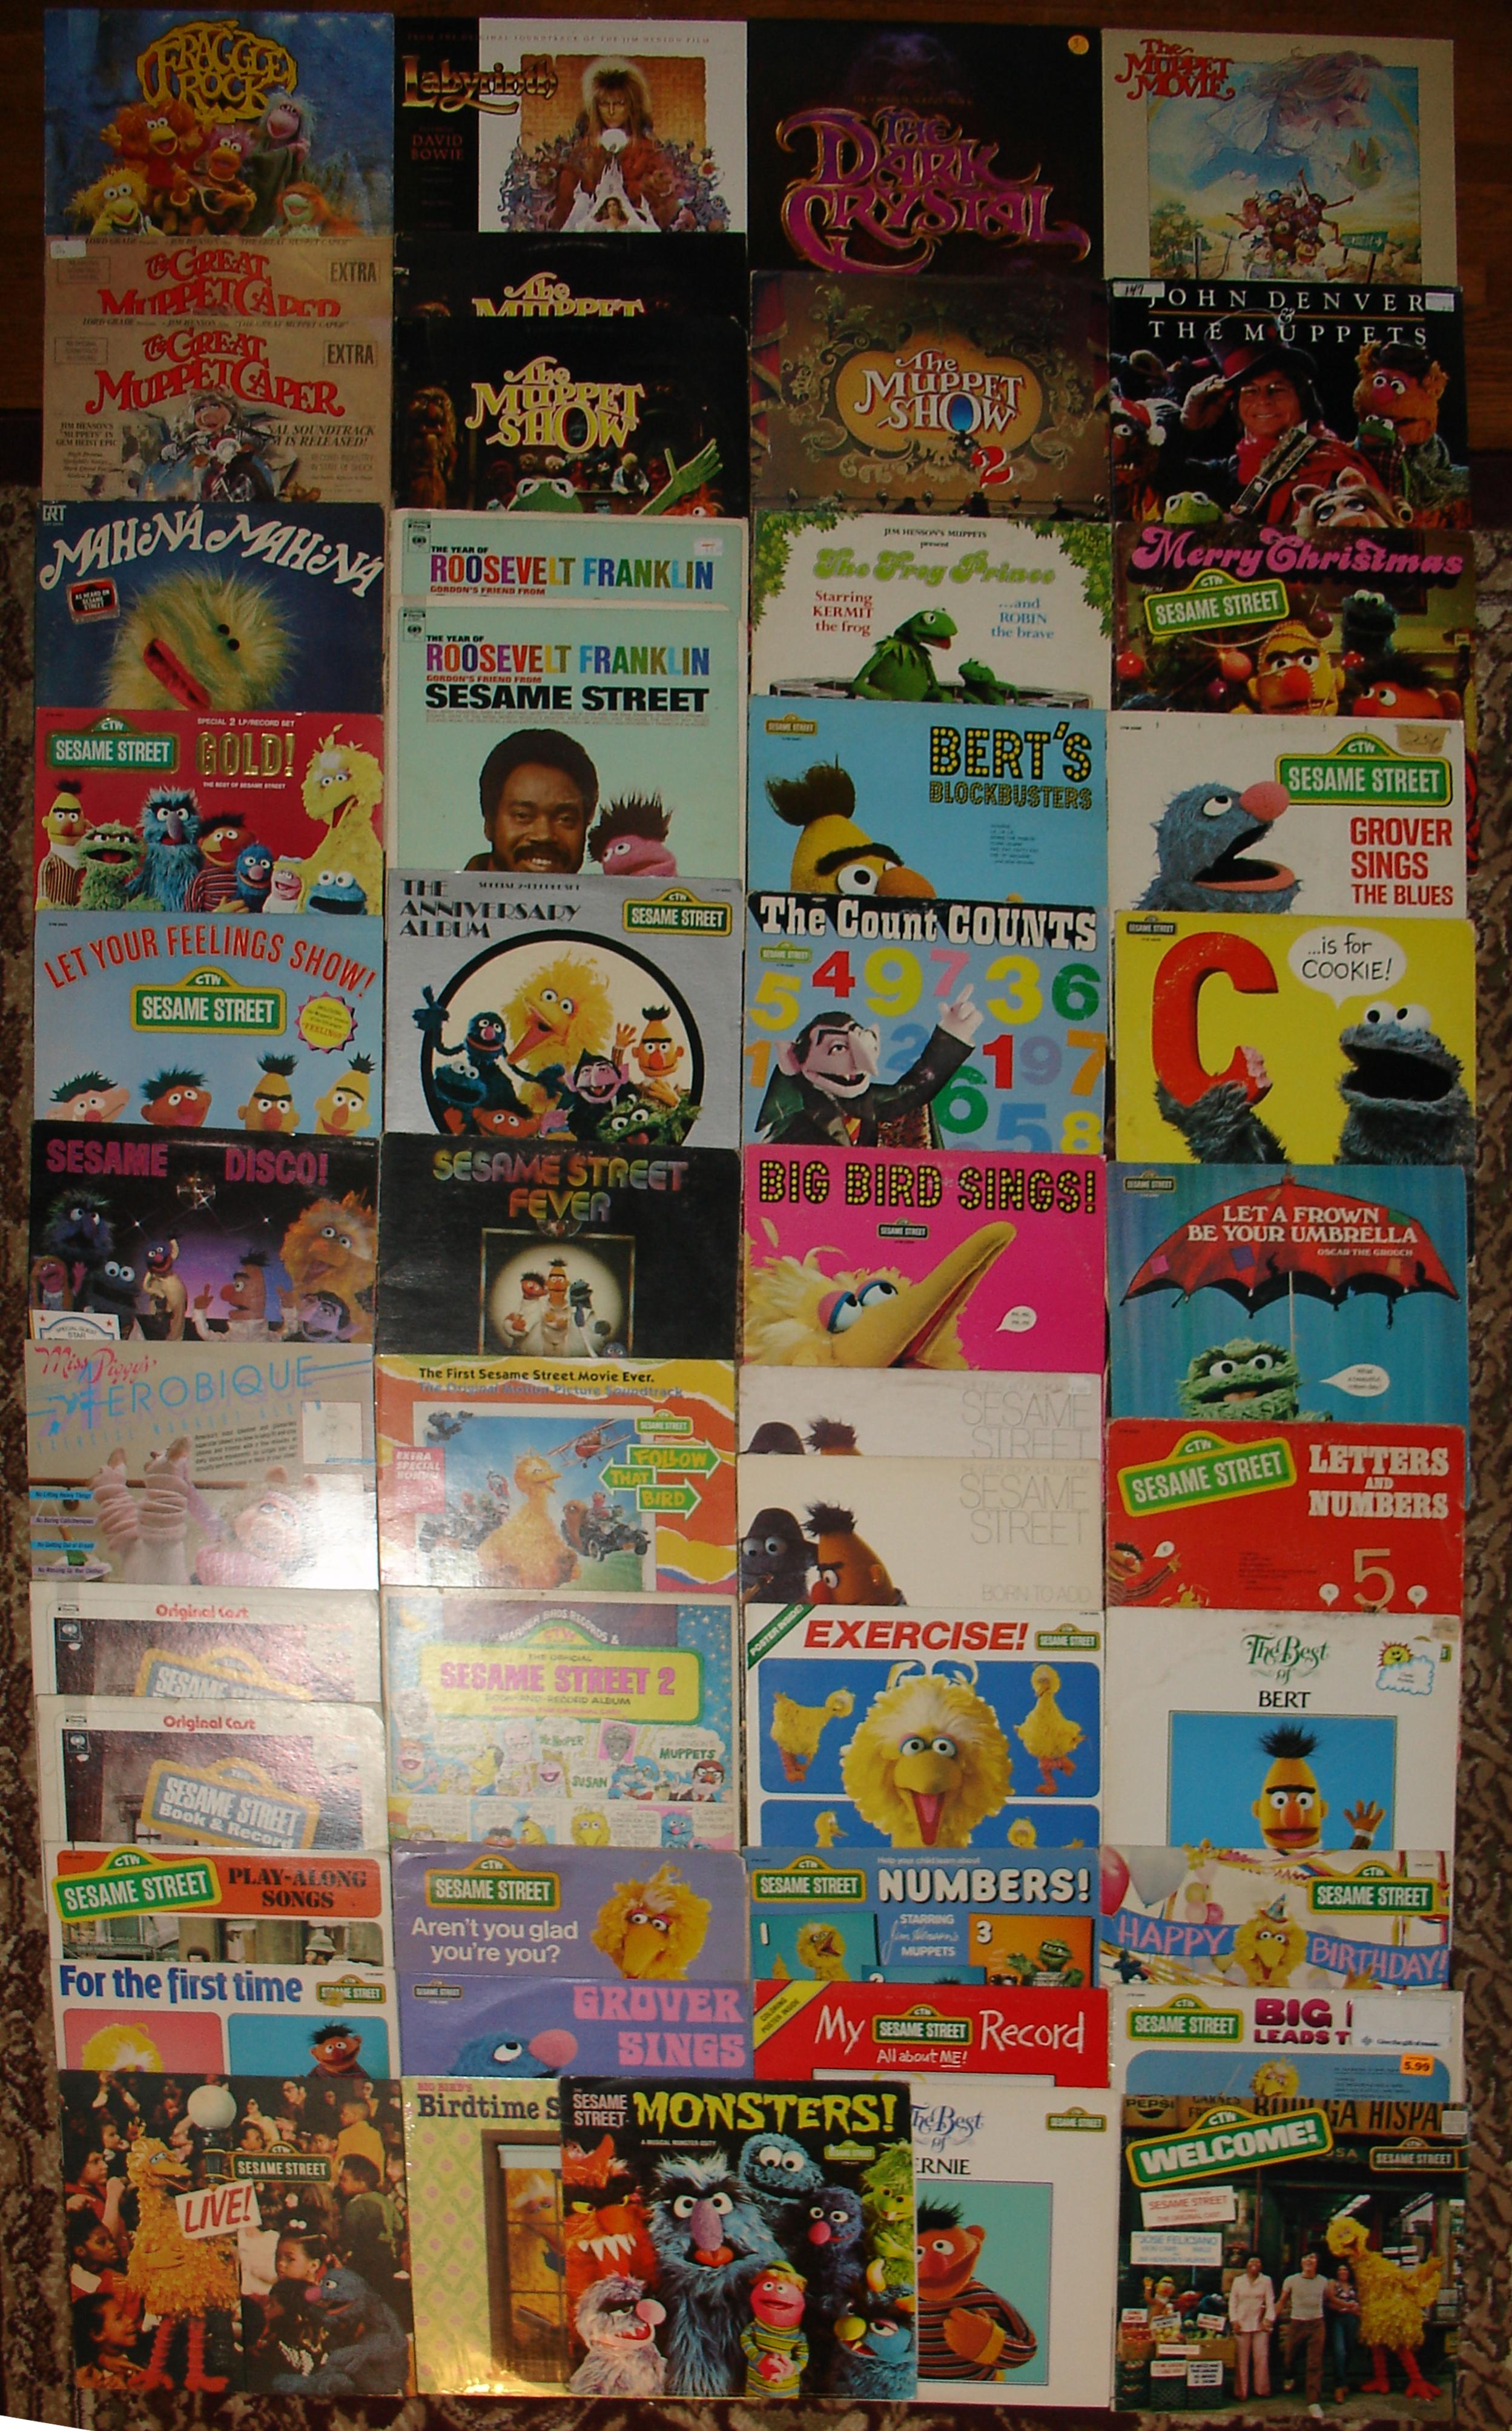 Jim Henson Record Collection 05-28-18.JPG